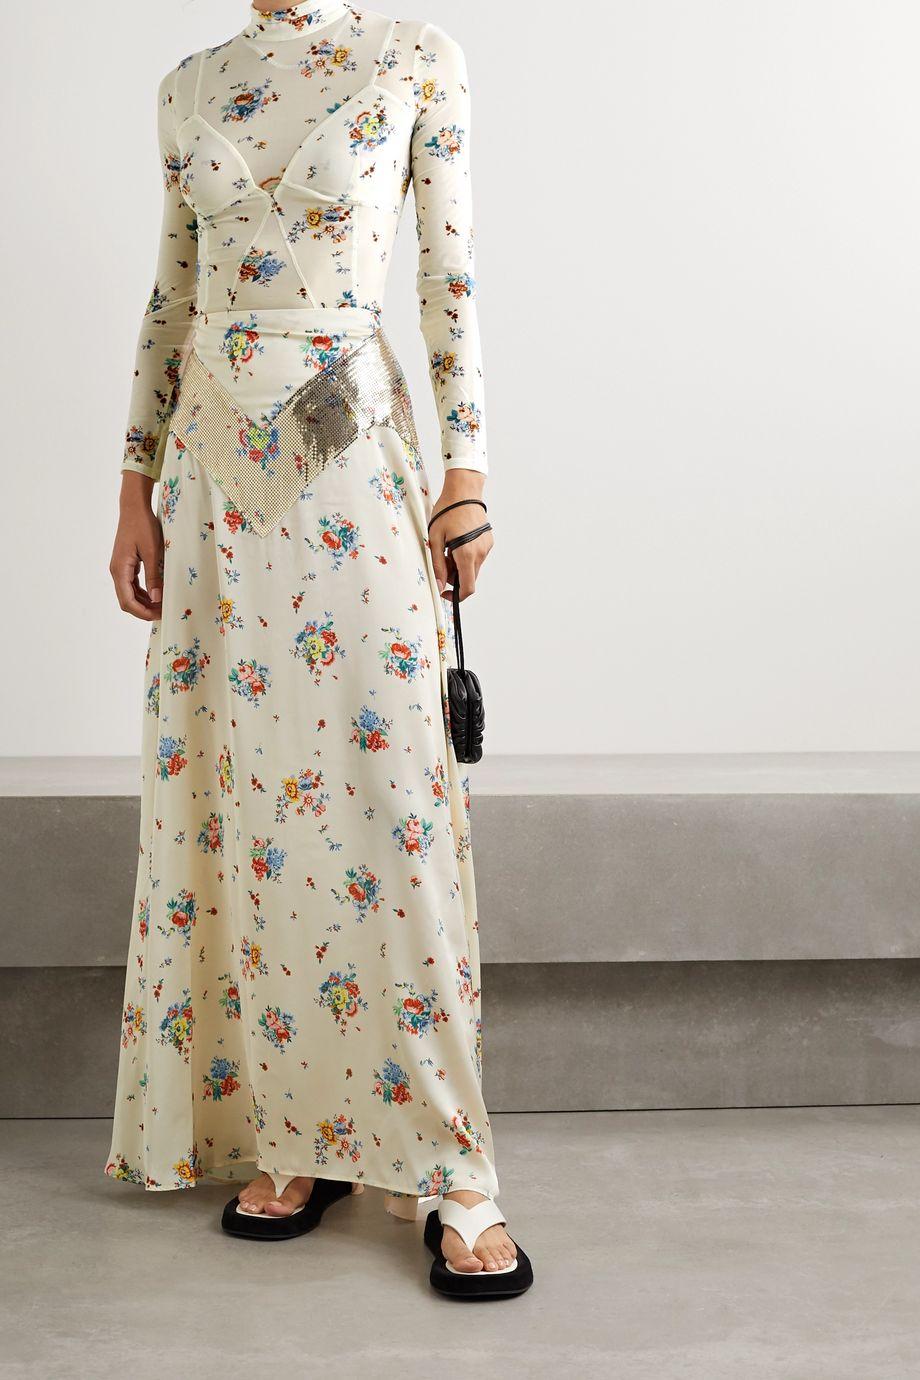 Paco Rabanne 锁子甲边饰花卉印花缎布超长半身裙